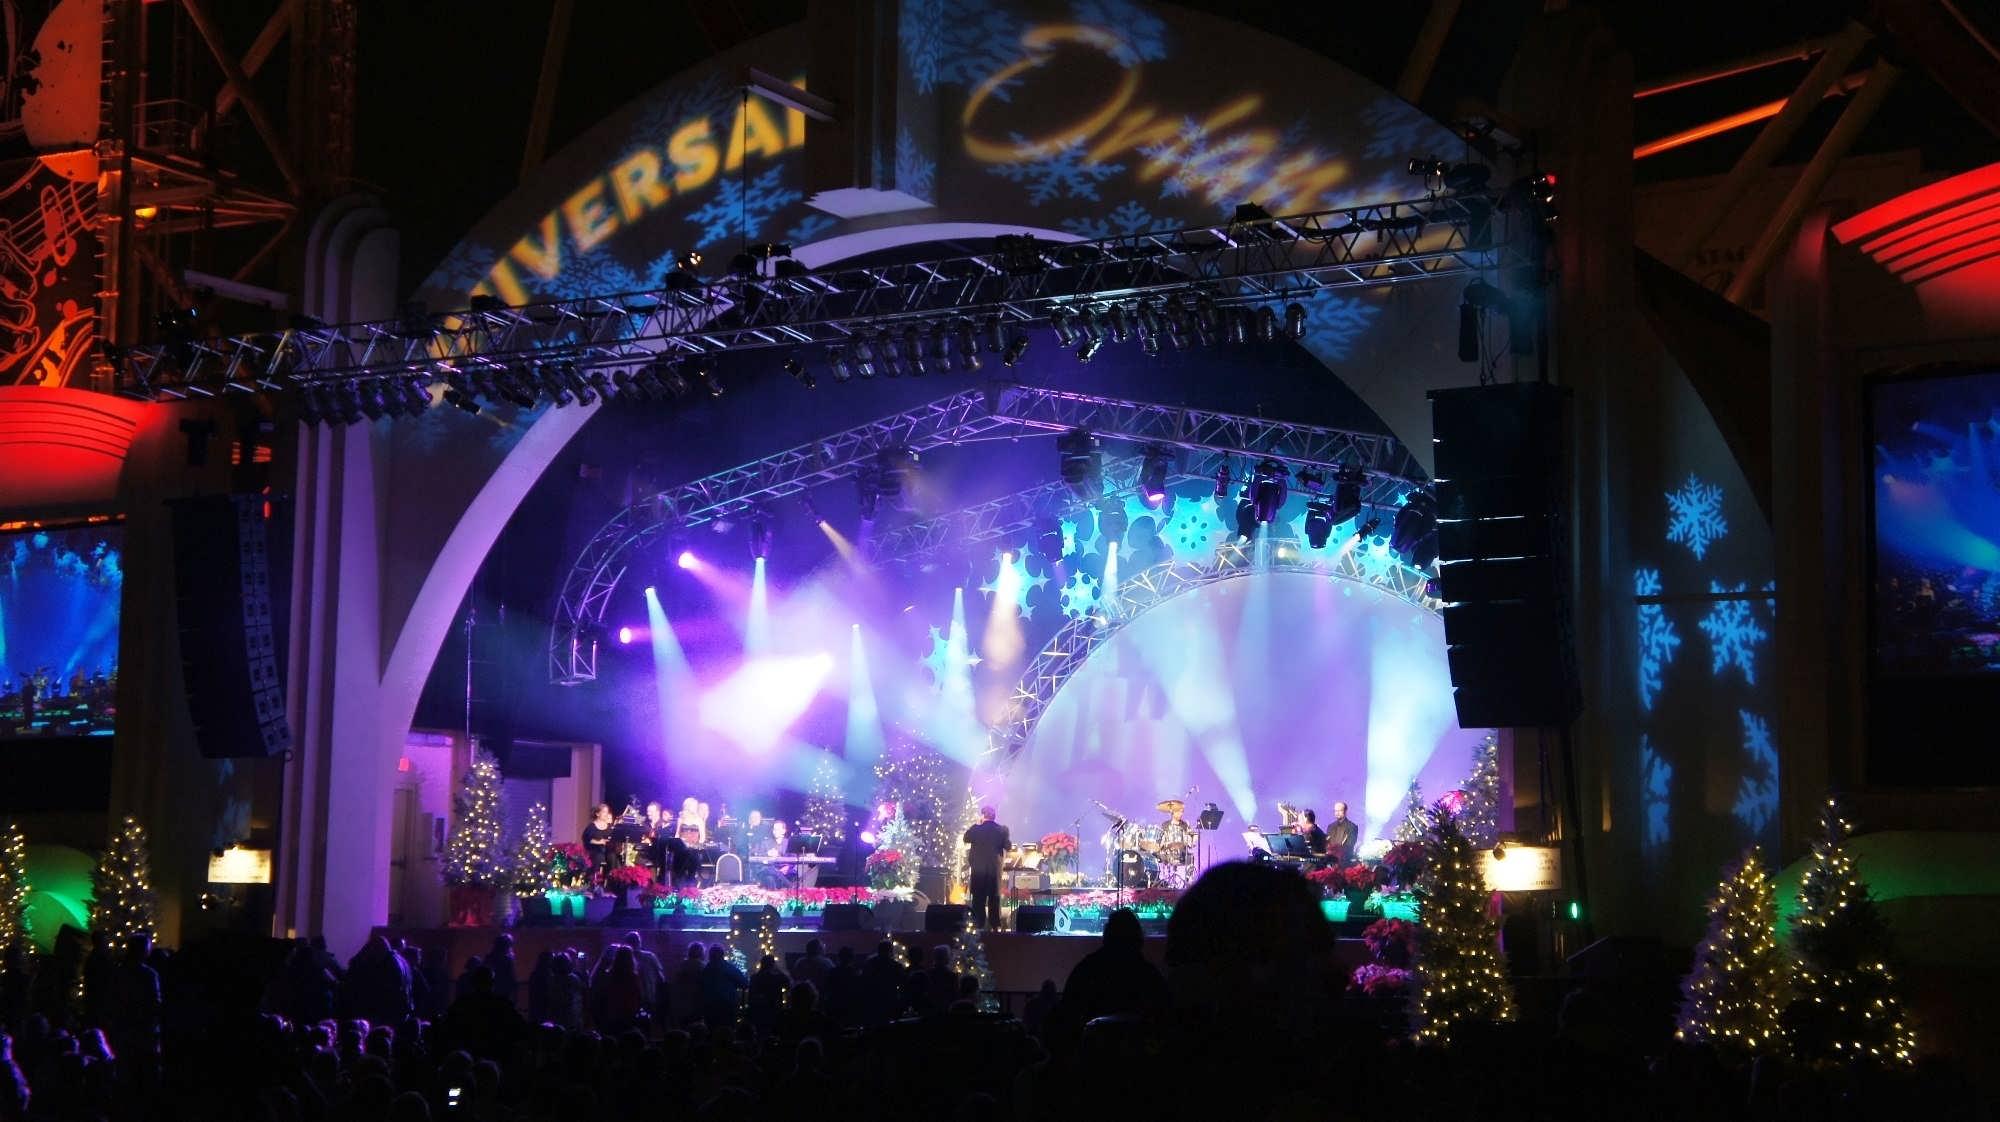 Mannheim Steamroller live at Universal Studios Florida.